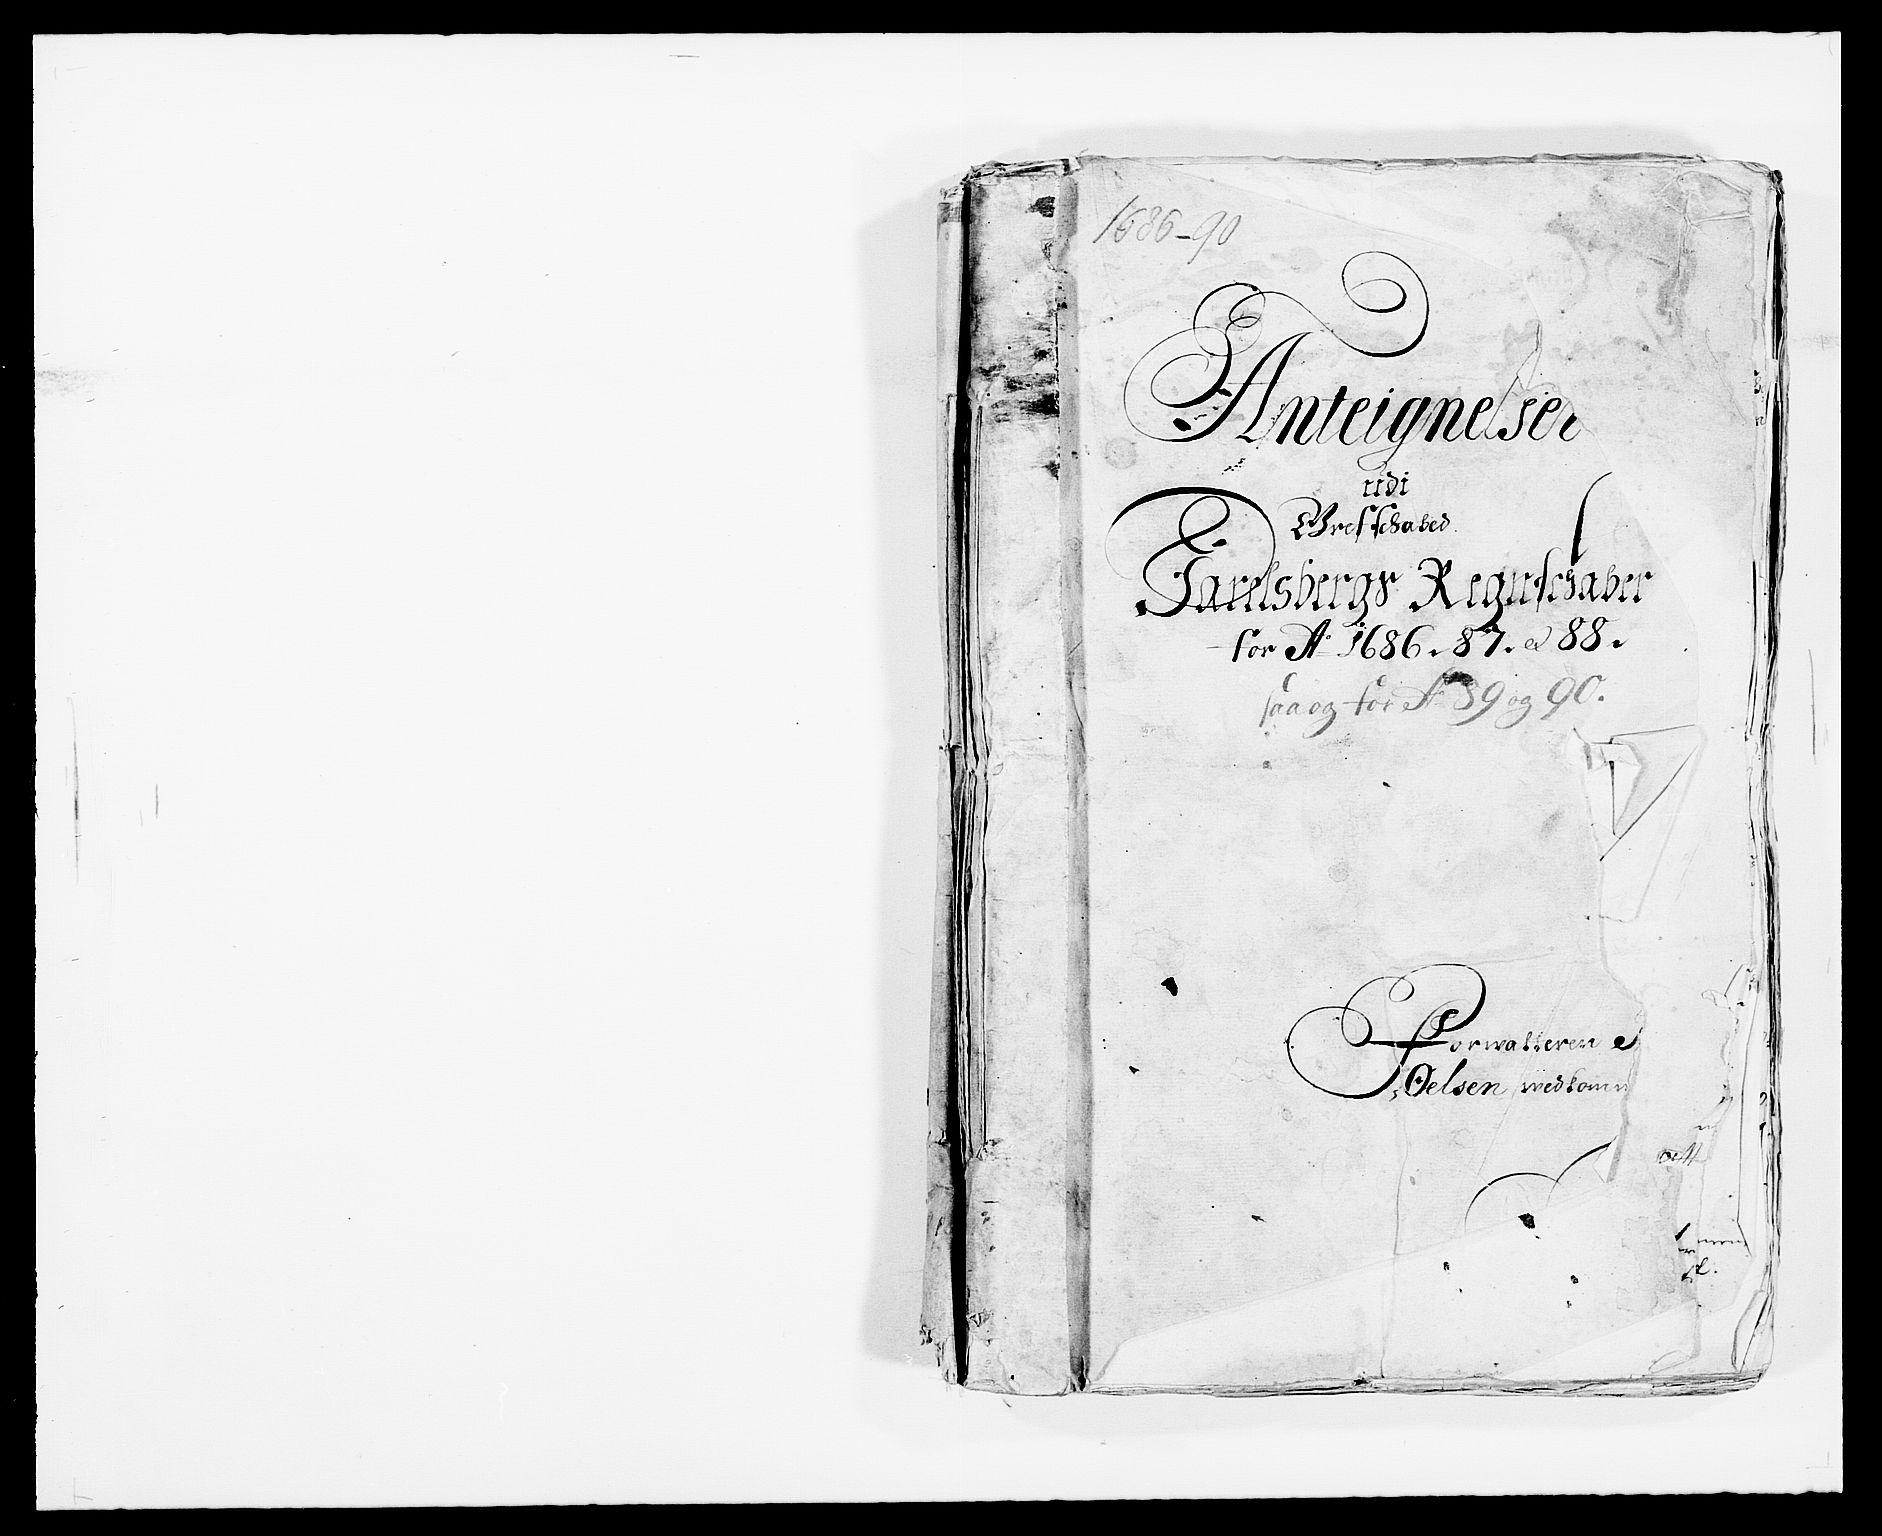 RA, Rentekammeret inntil 1814, Reviderte regnskaper, Fogderegnskap, R32/L1862: Fogderegnskap Jarlsberg grevskap, 1686-1690, s. 1